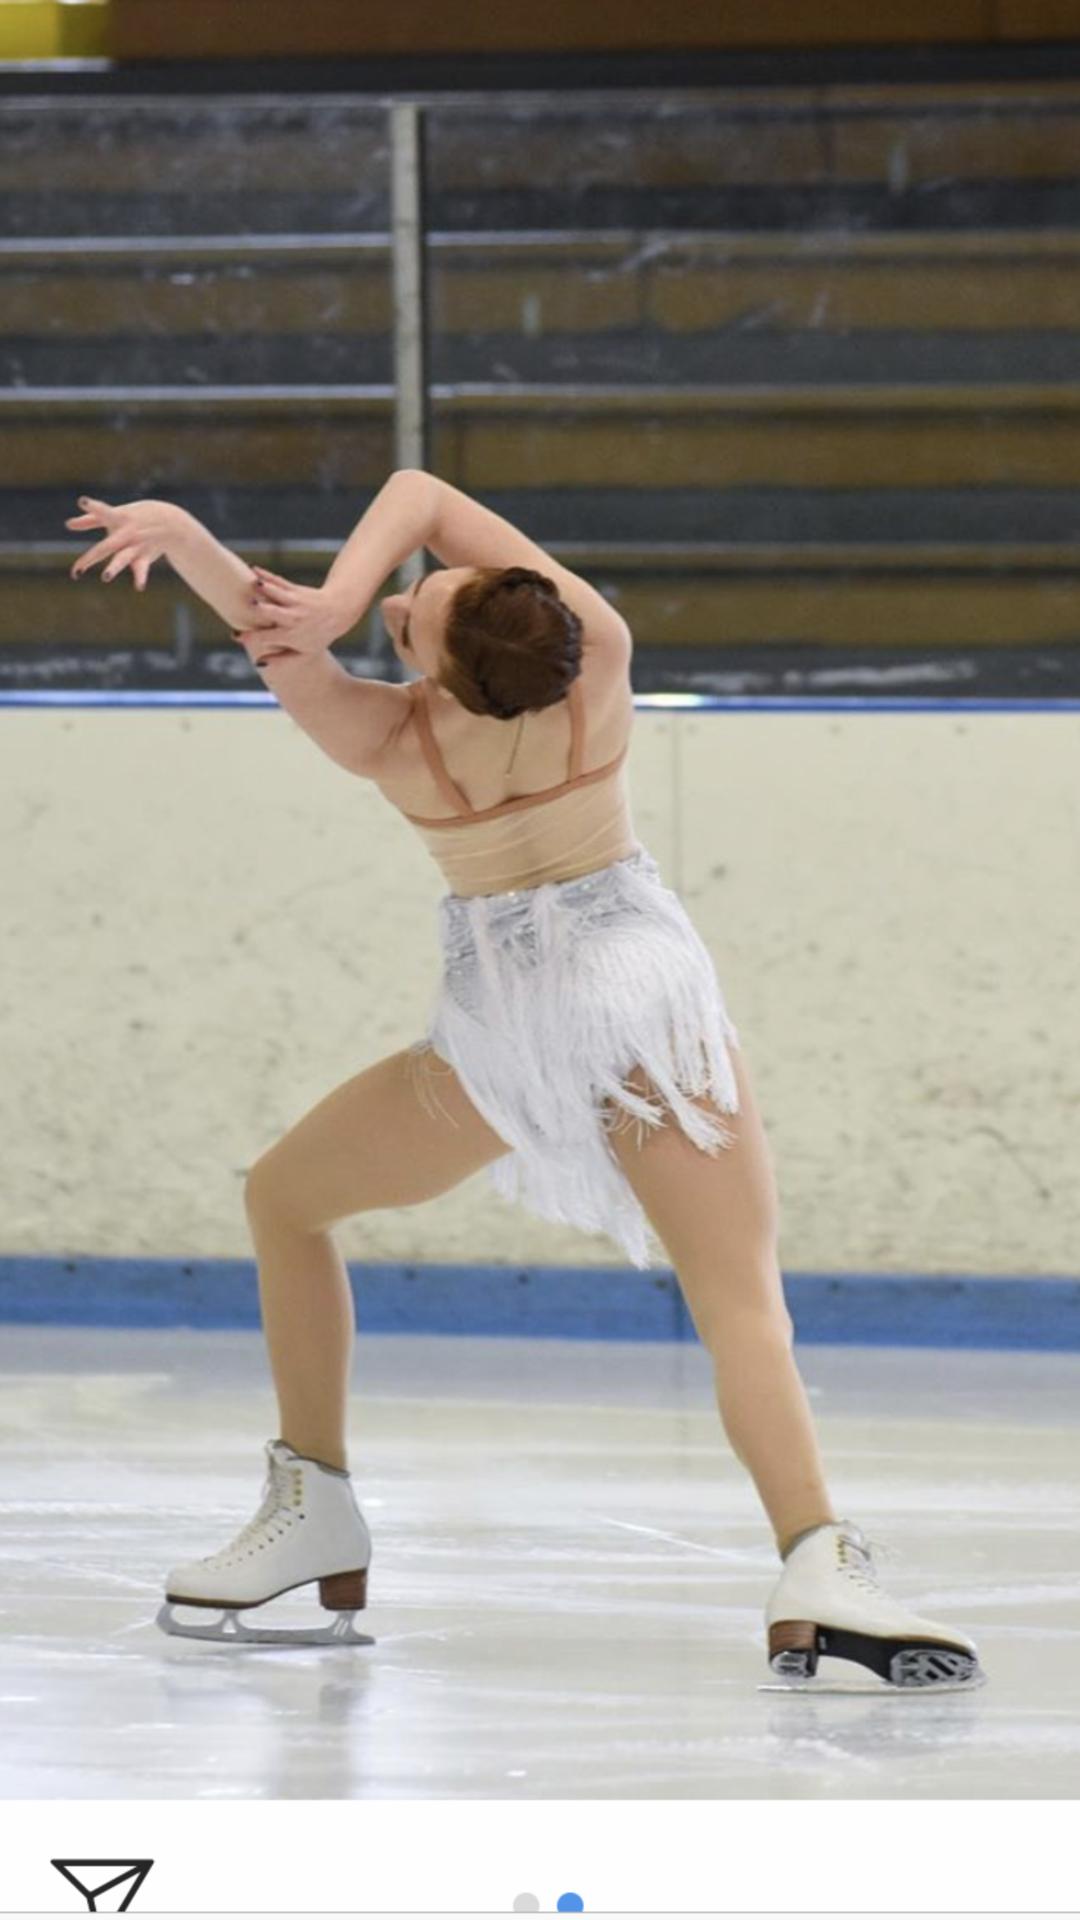 Student Figure Skating